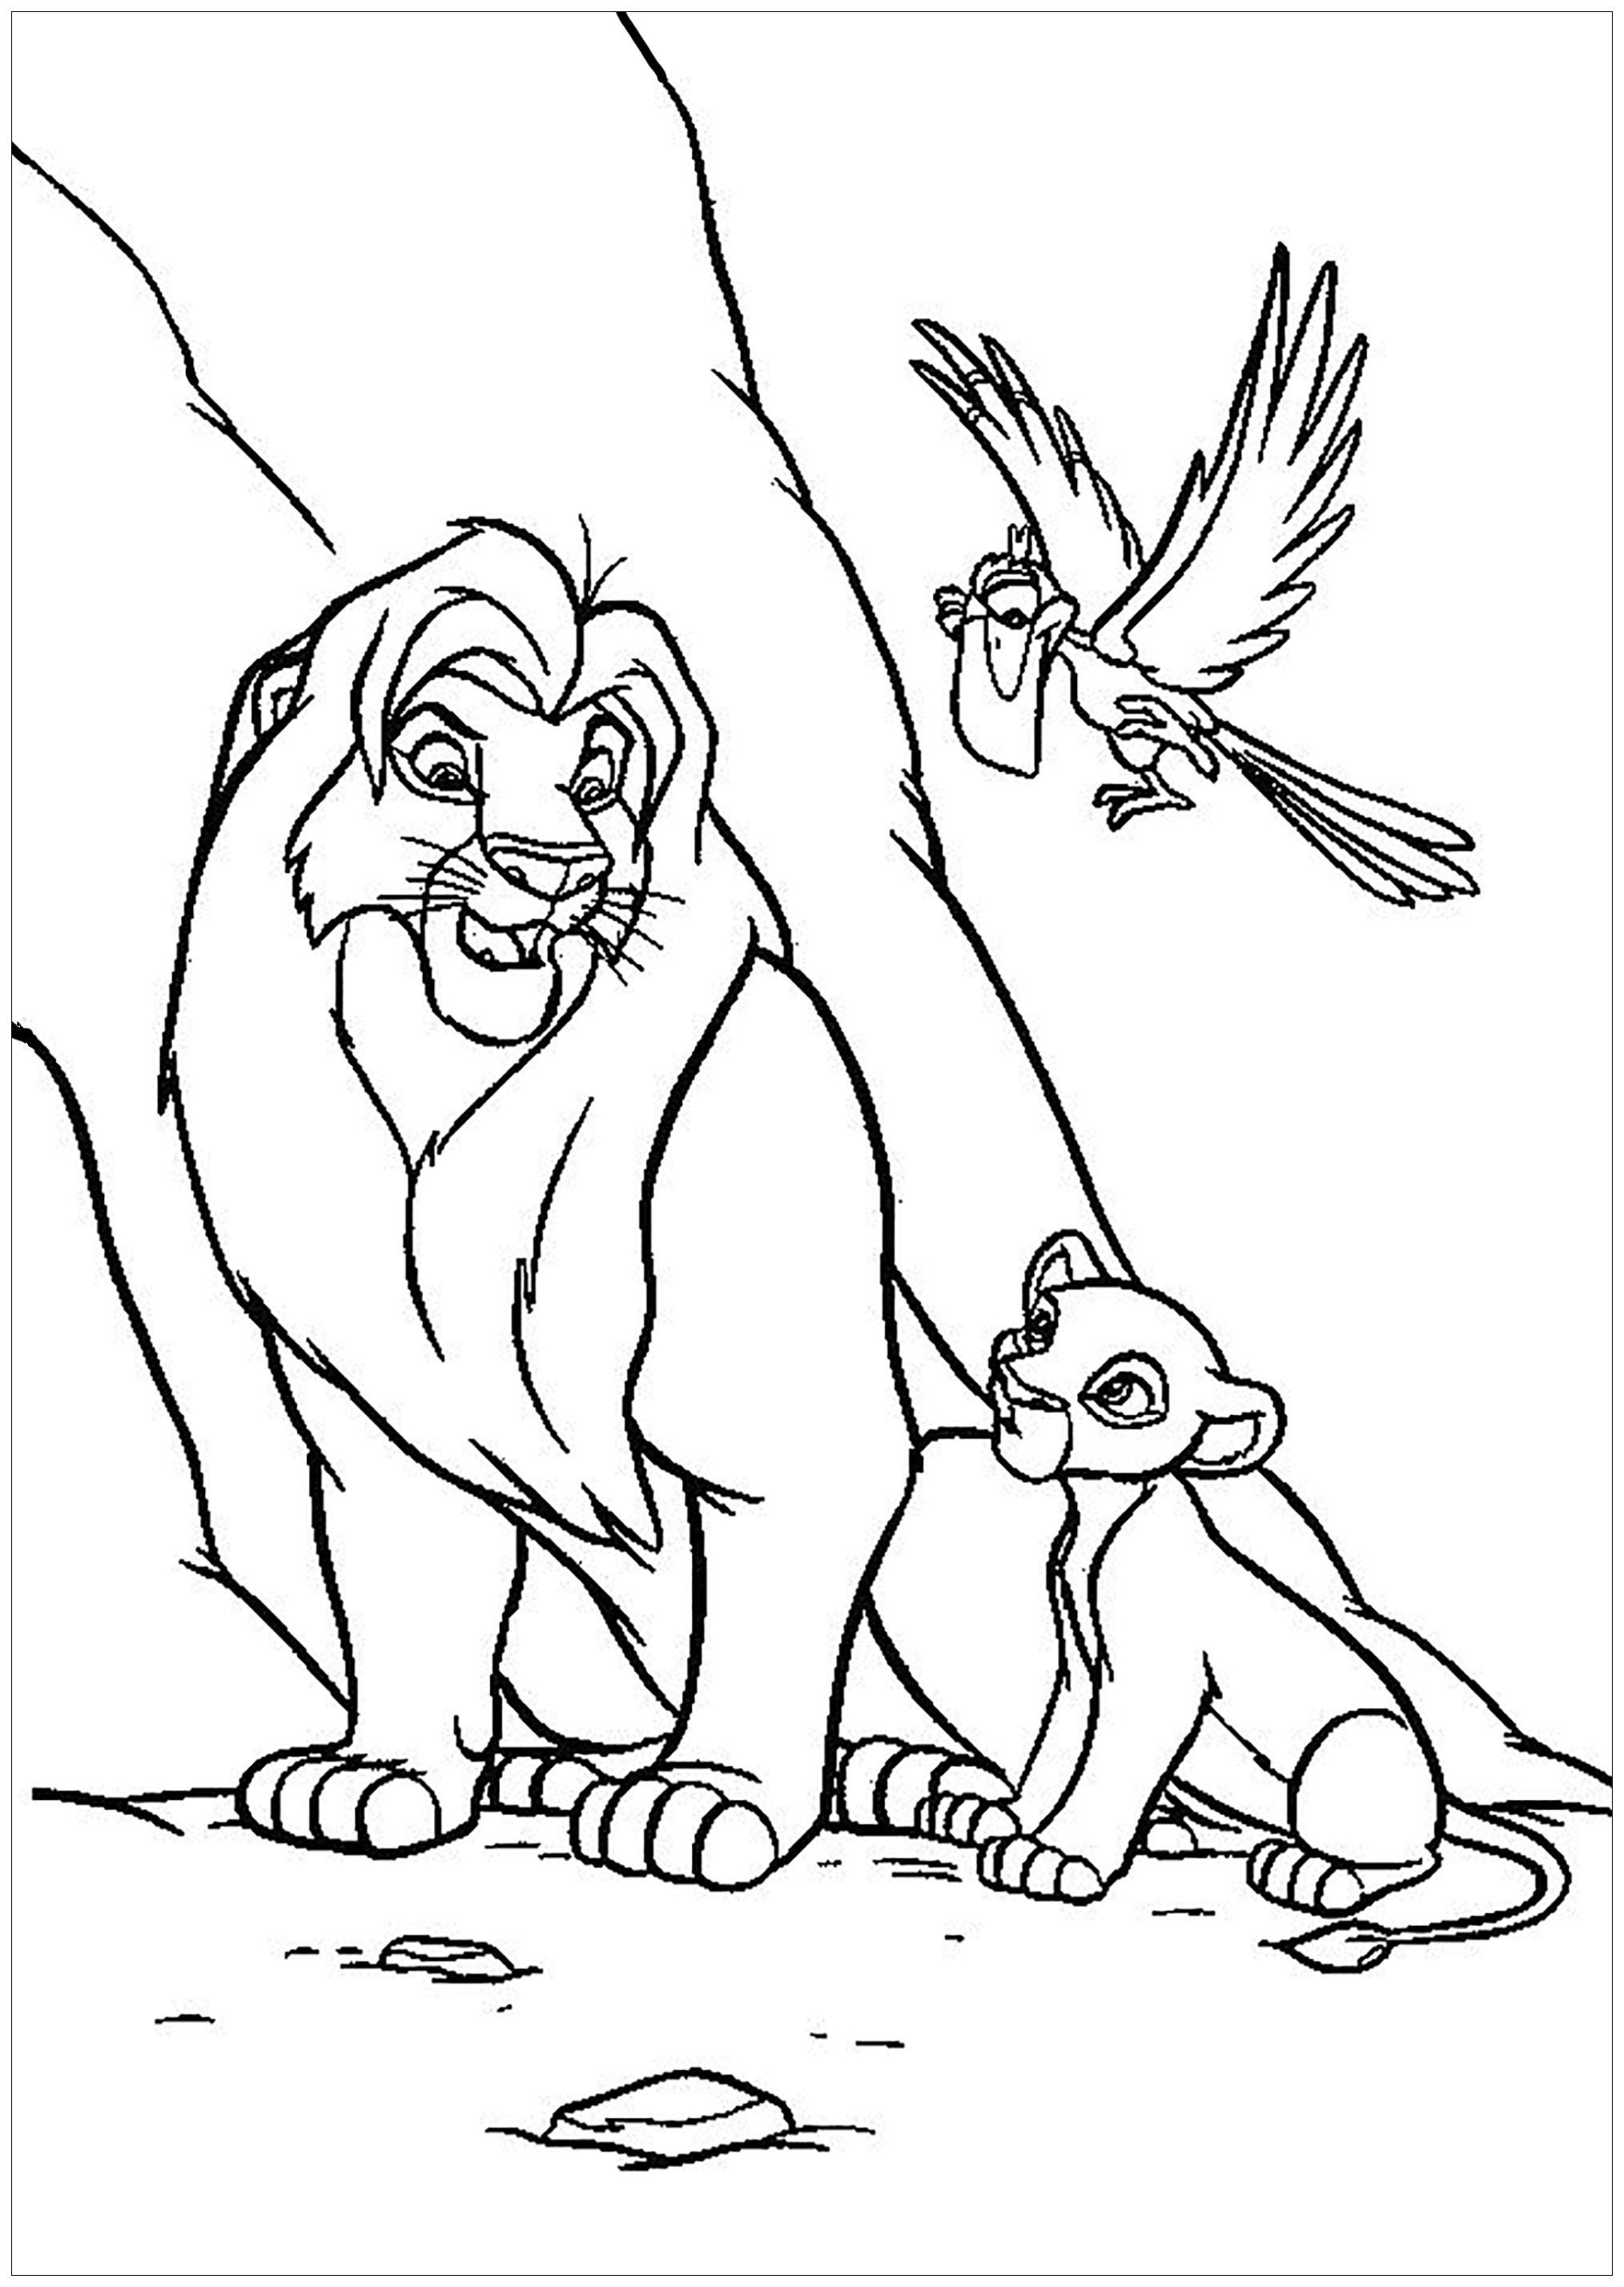 Lion King Coloring Page With Mufasa Simba And Zazu